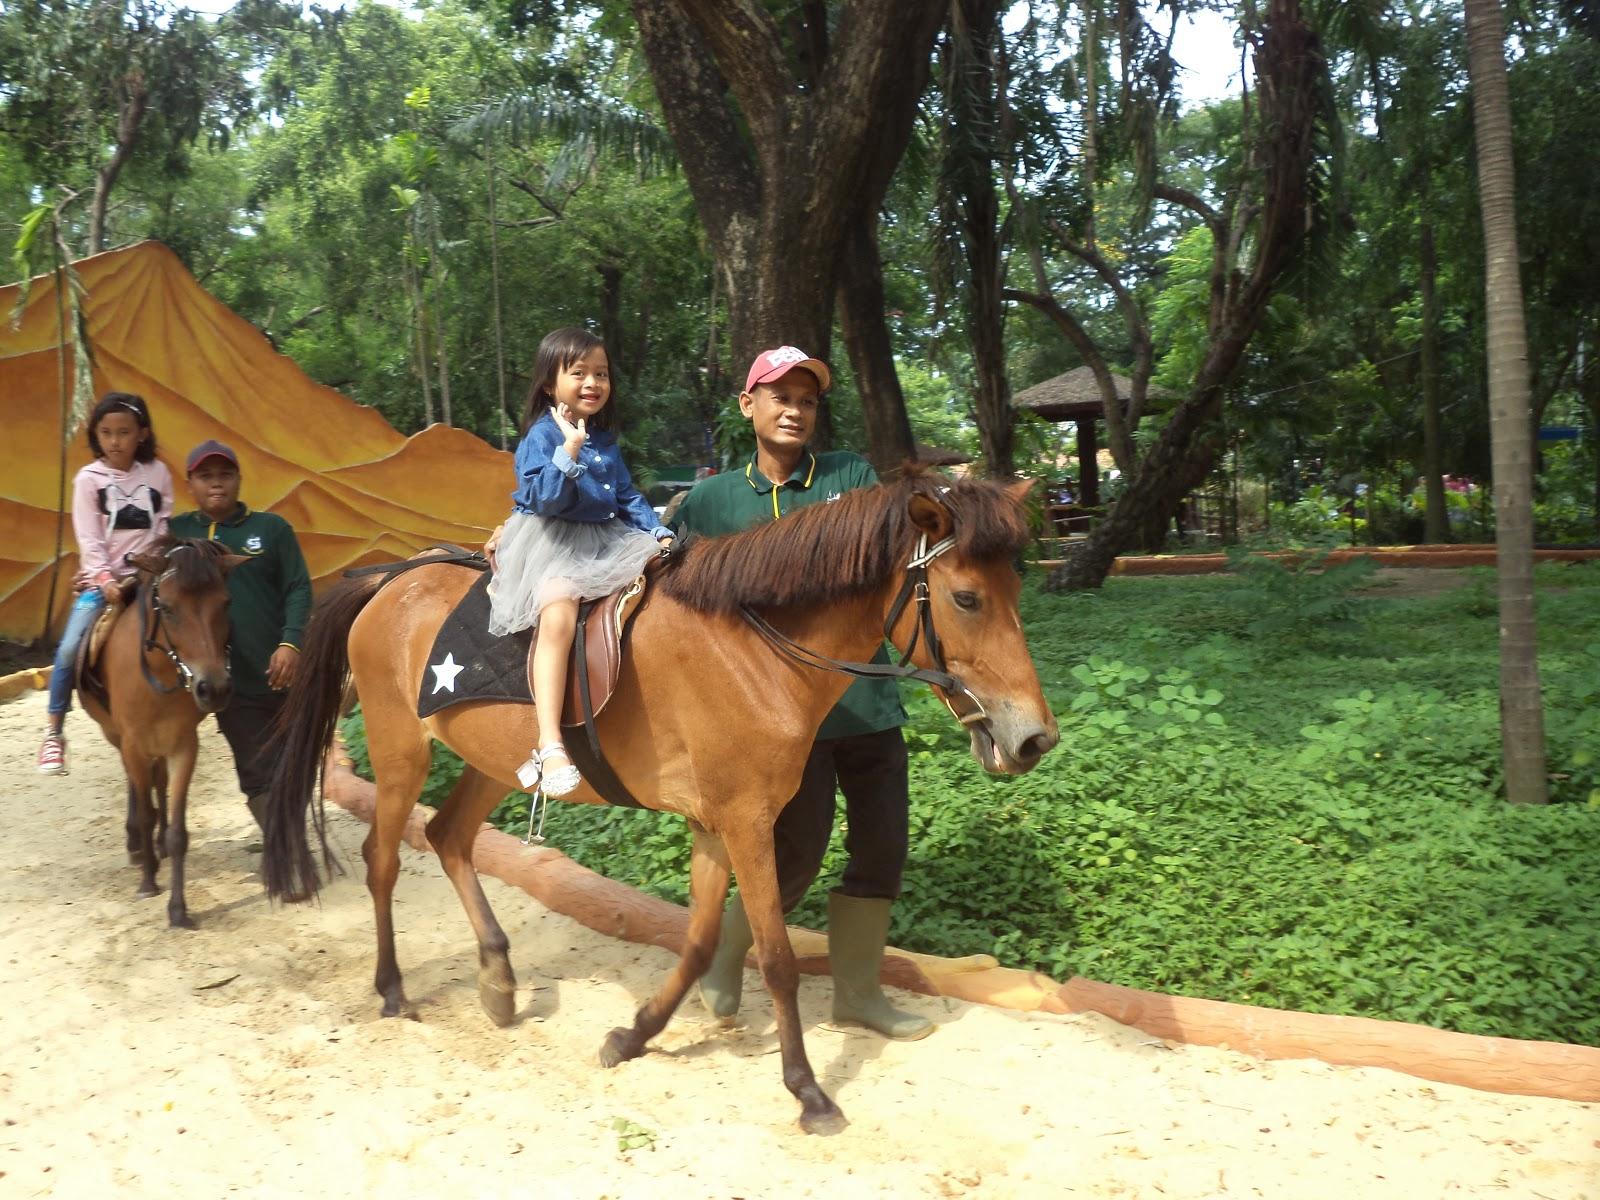 Area berkuda dan naik unta yang bersih harga naik Wahana ini adalah Rp15.000